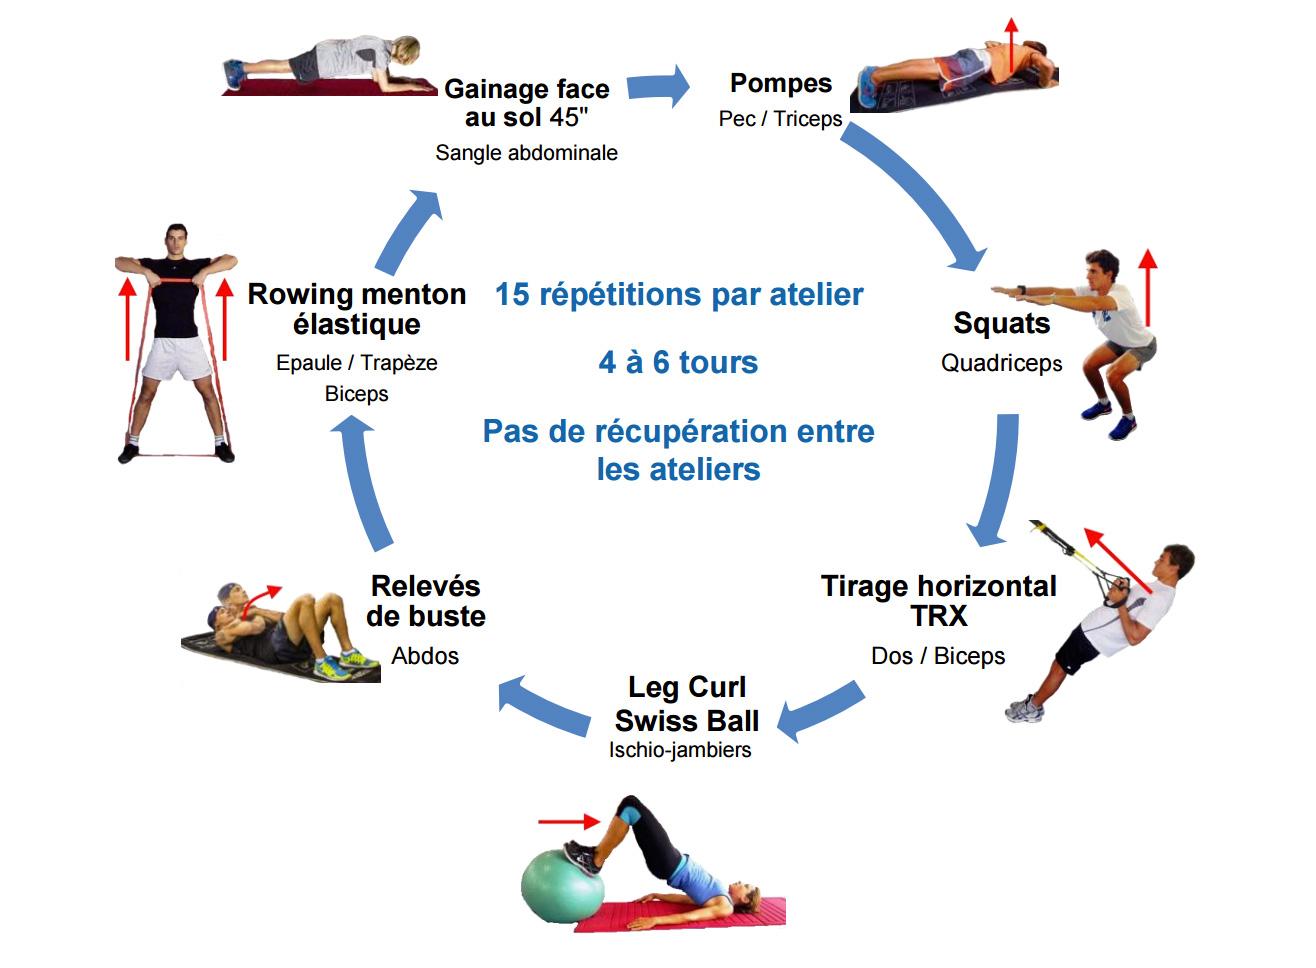 tieu-diet-mo-Christian-Thibaudeau-P2-1